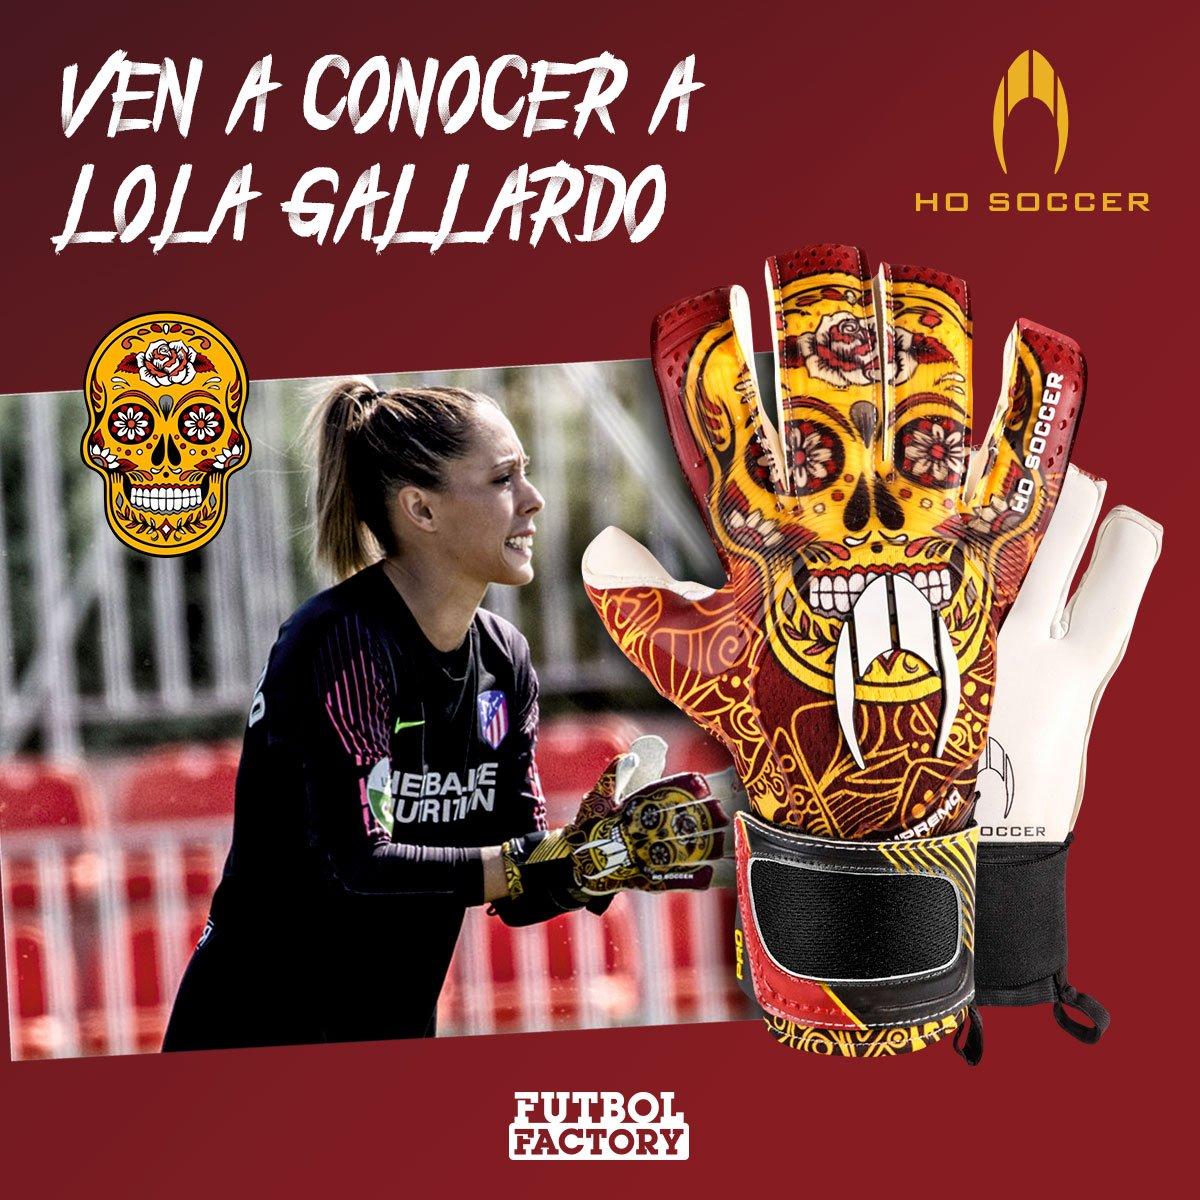 1d0f89716cd3e Fútbol Factory on Twitter